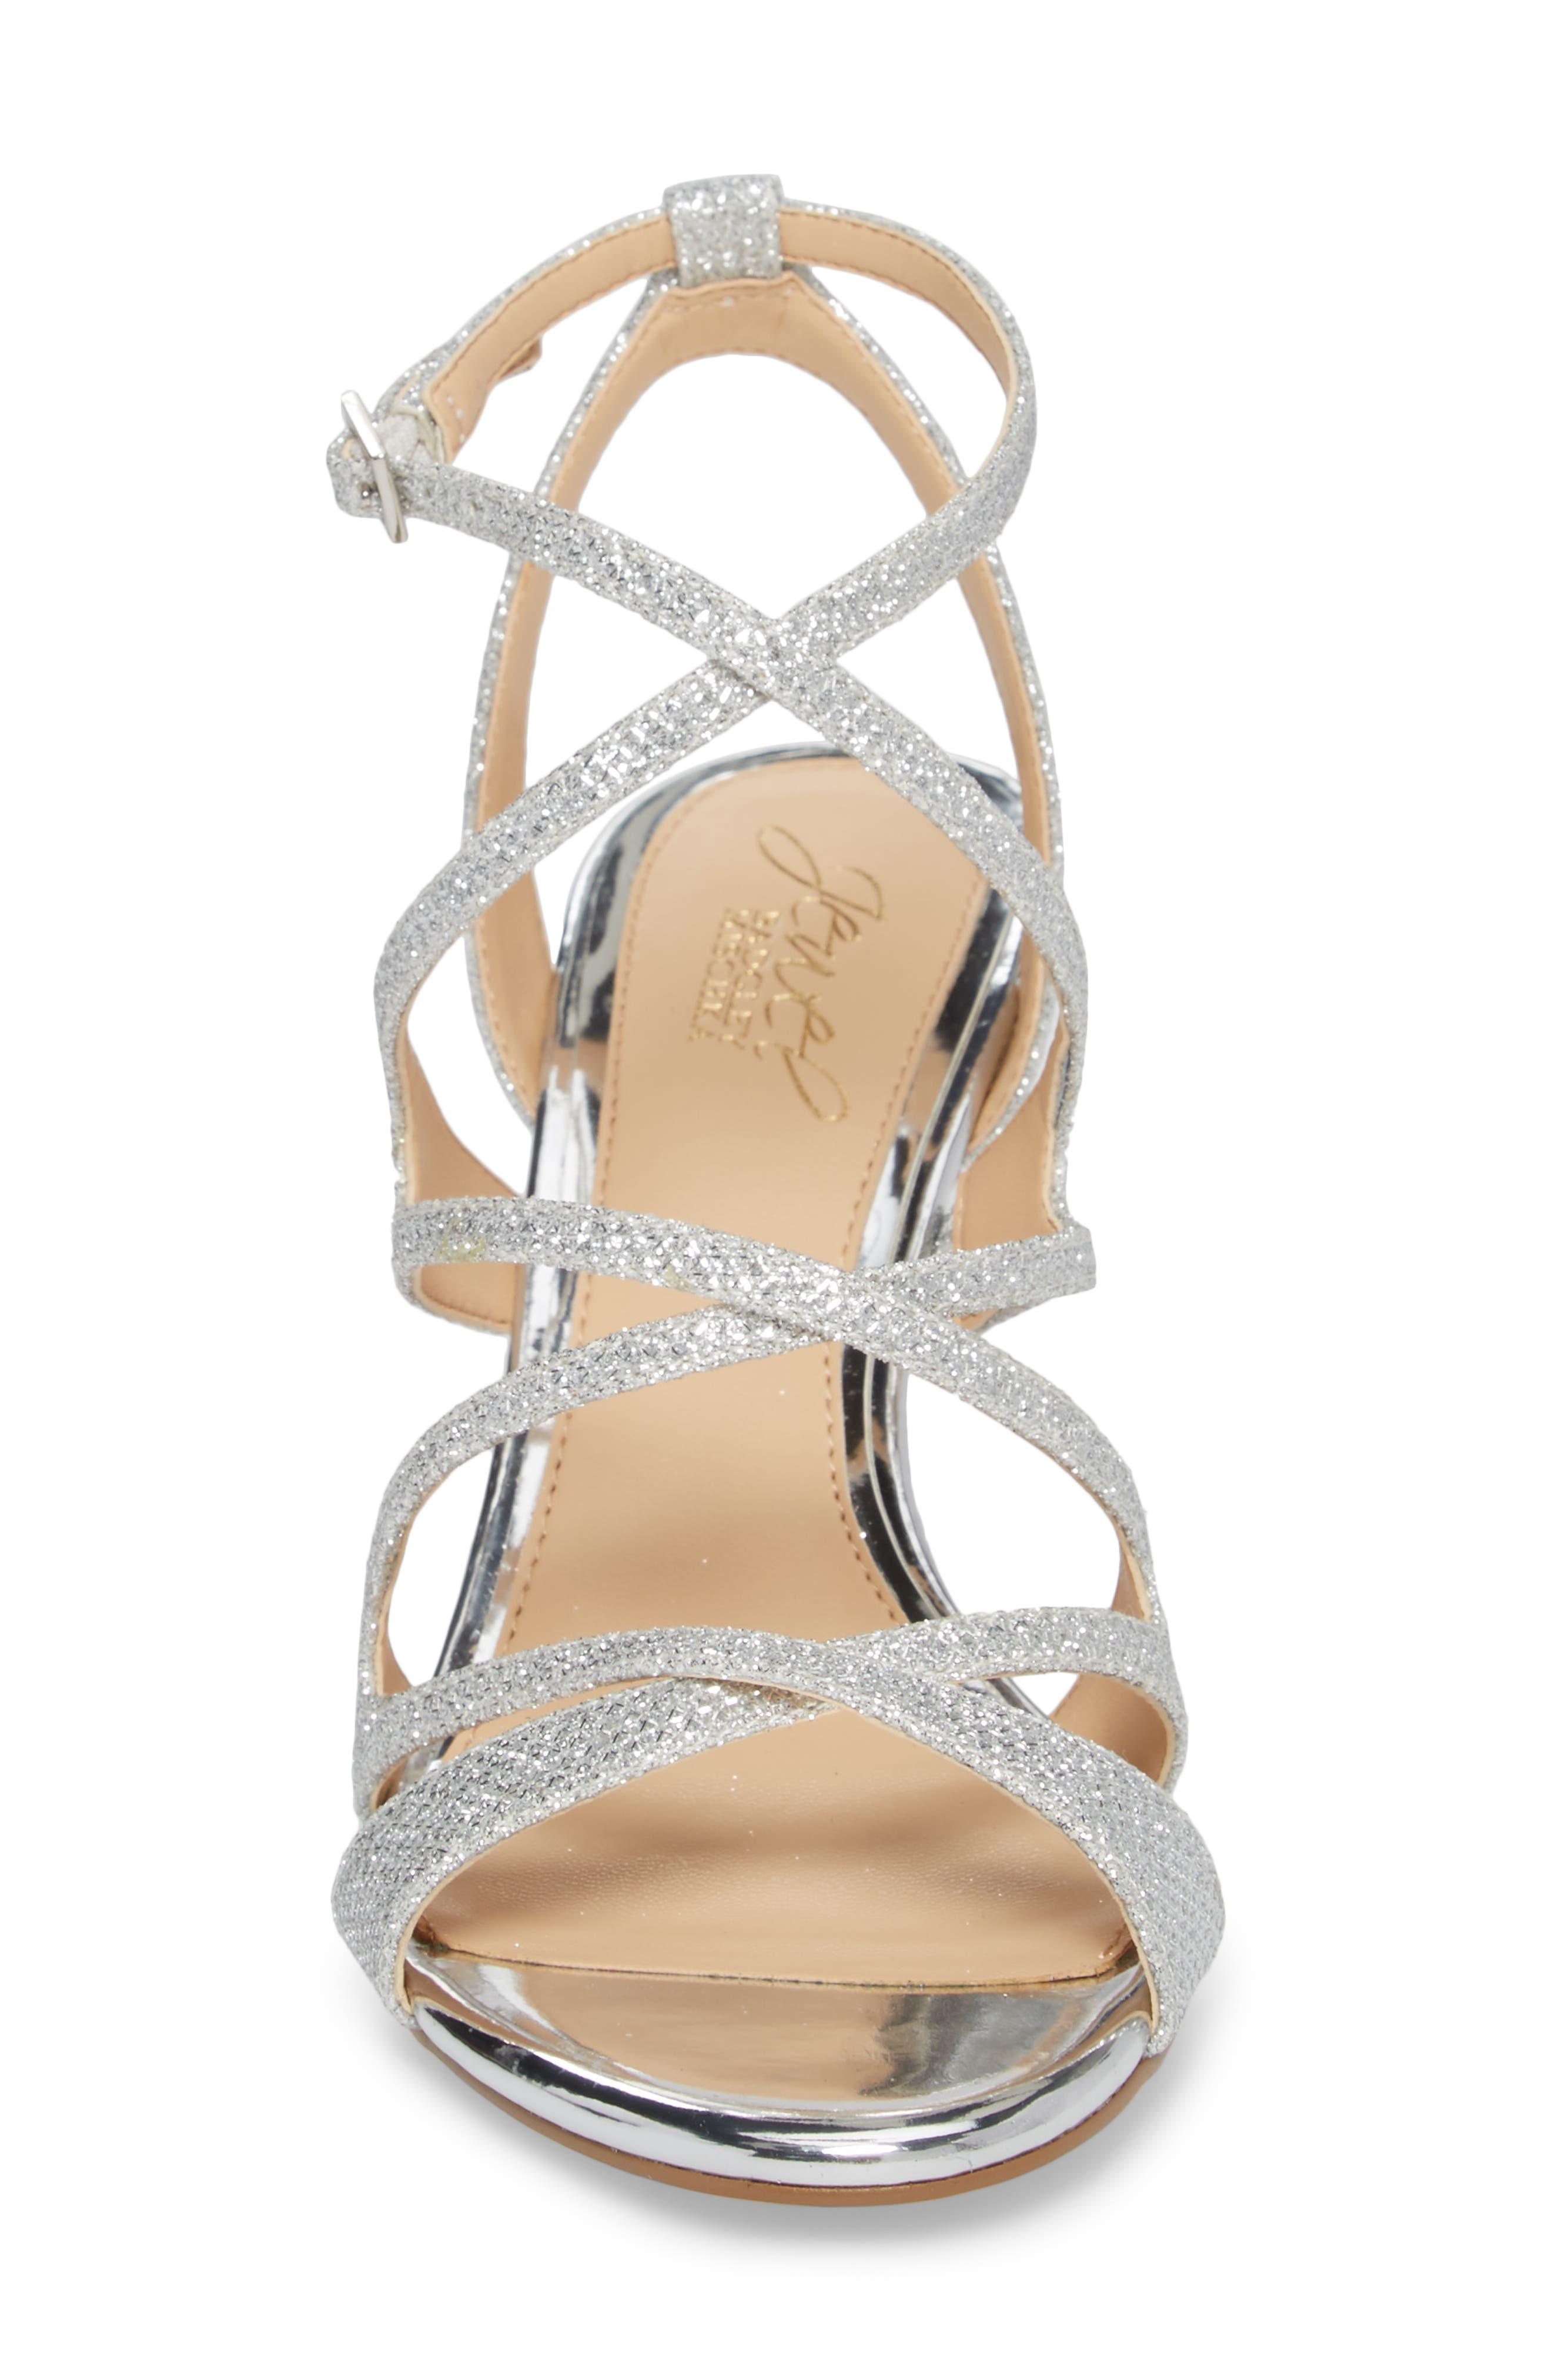 Tasha Glitter Sandal,                             Alternate thumbnail 4, color,                             043